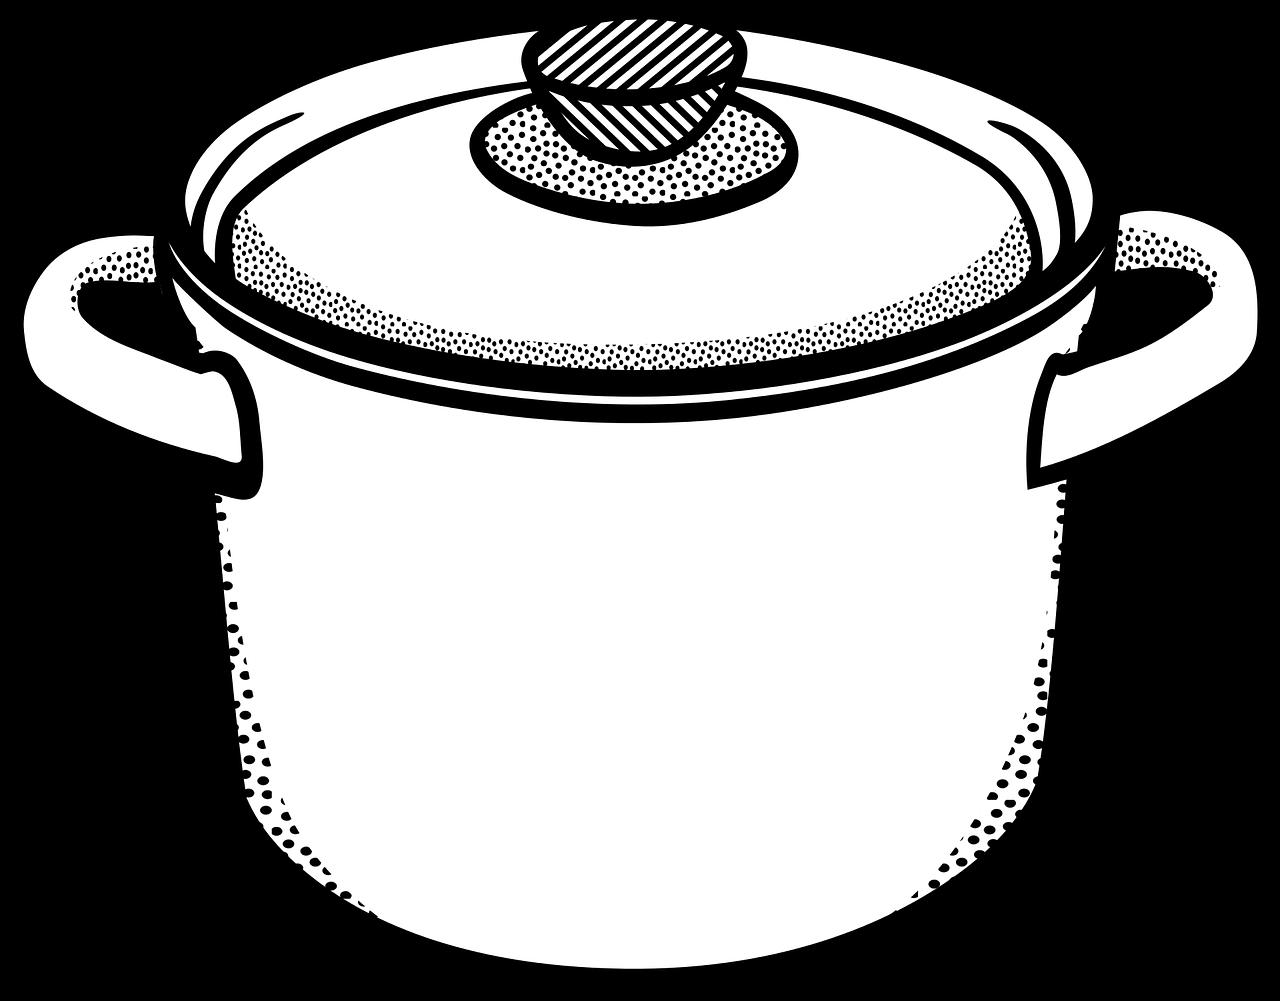 Kochtopf Symbol schwarz-weiß